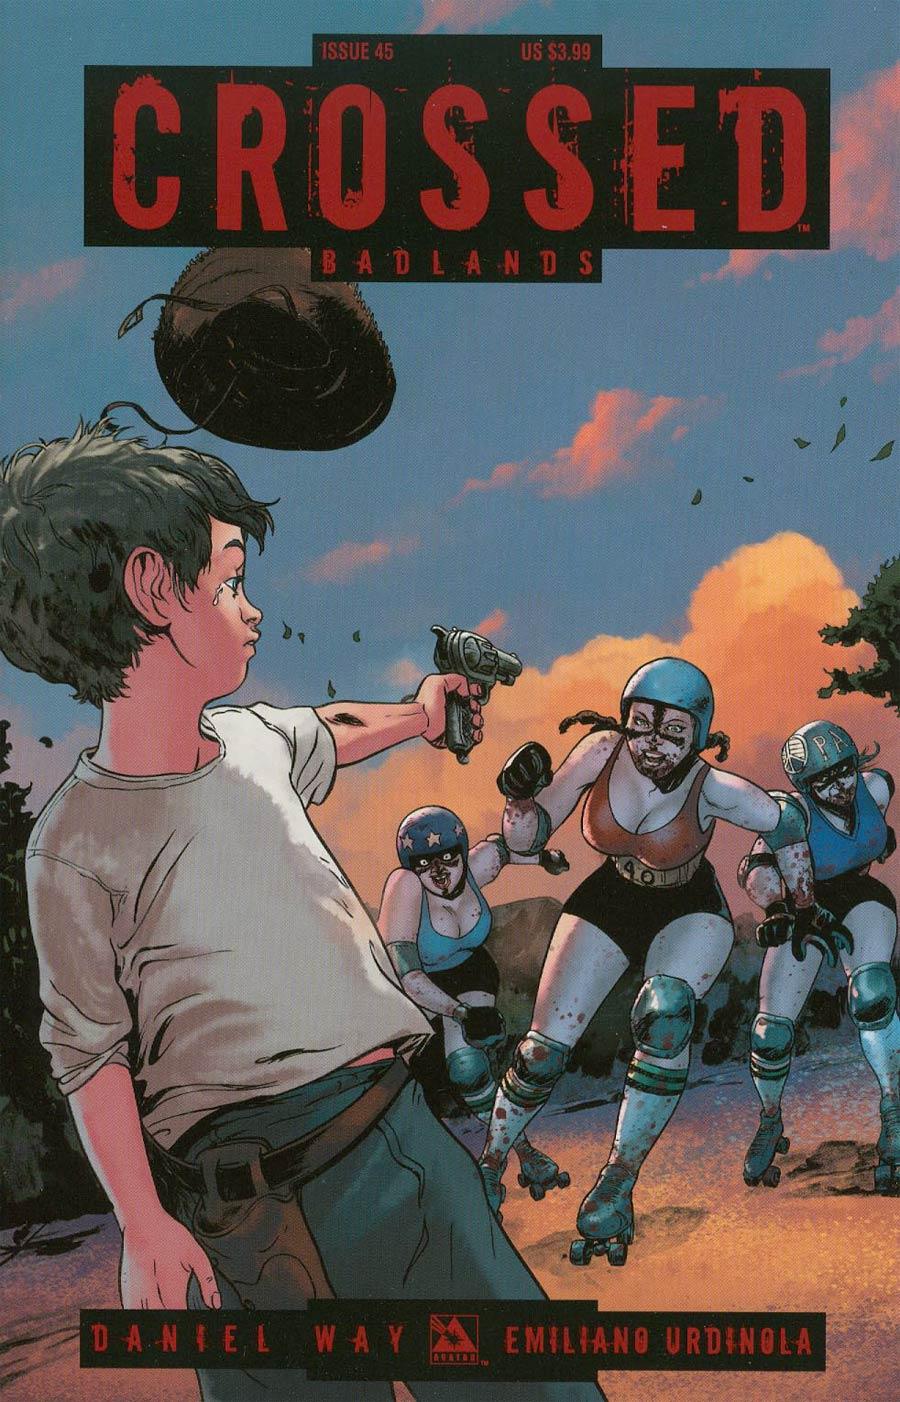 Crossed Badlands #45 Cover A Regular Cover